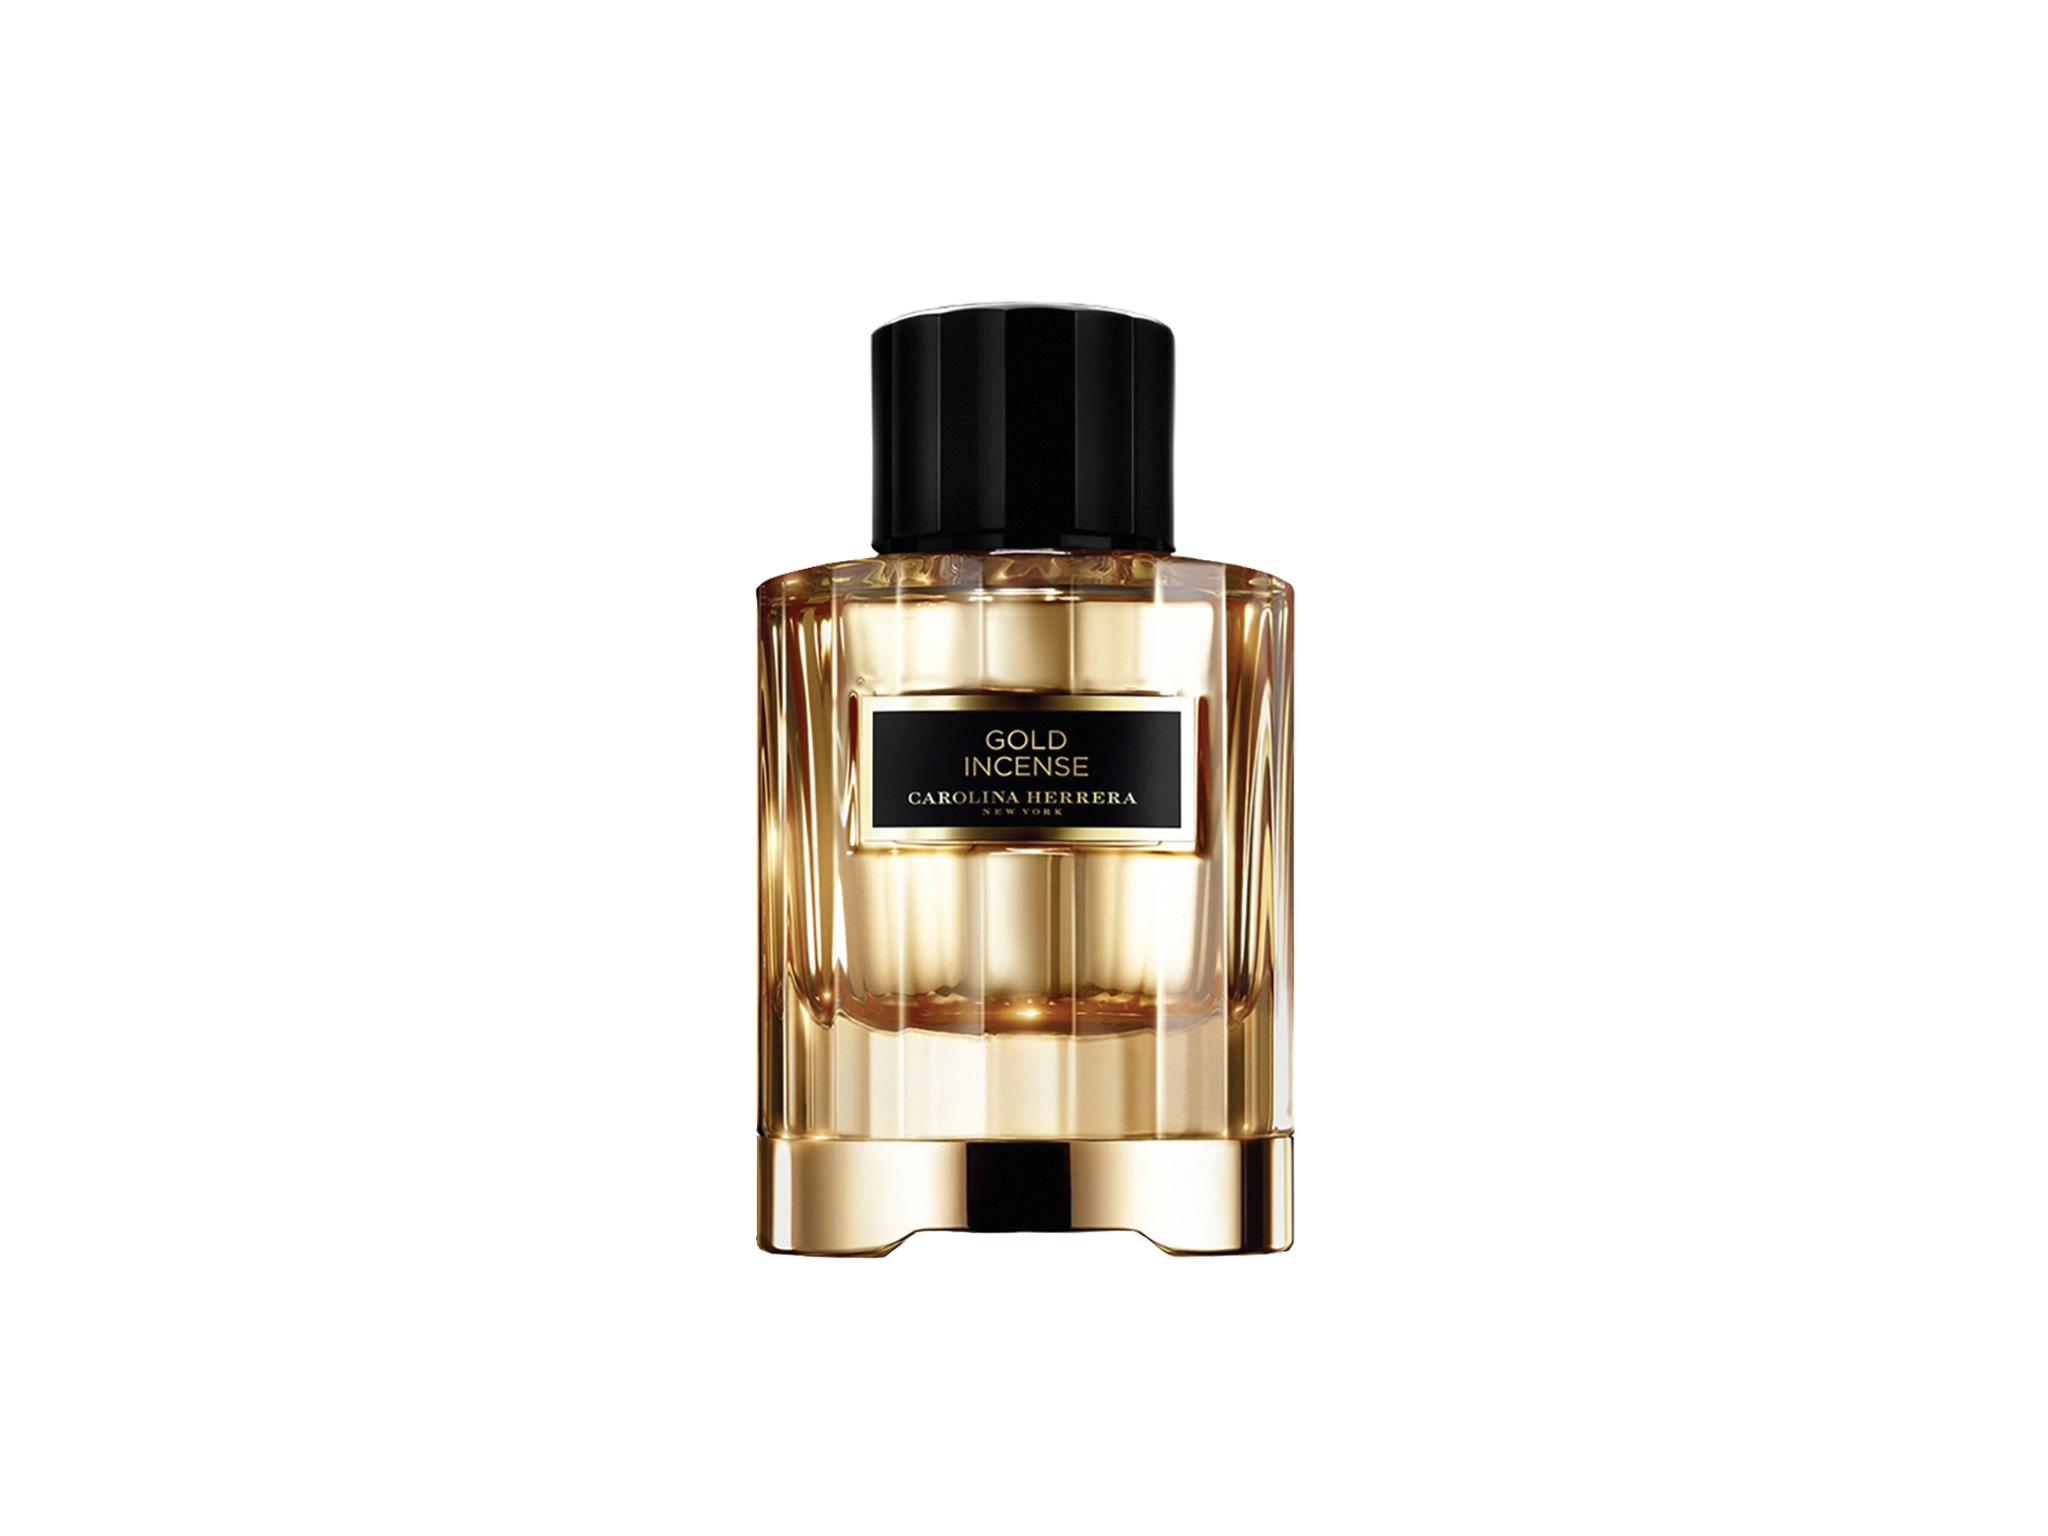 Perfumes, Gold Incense, Carolina Herrera